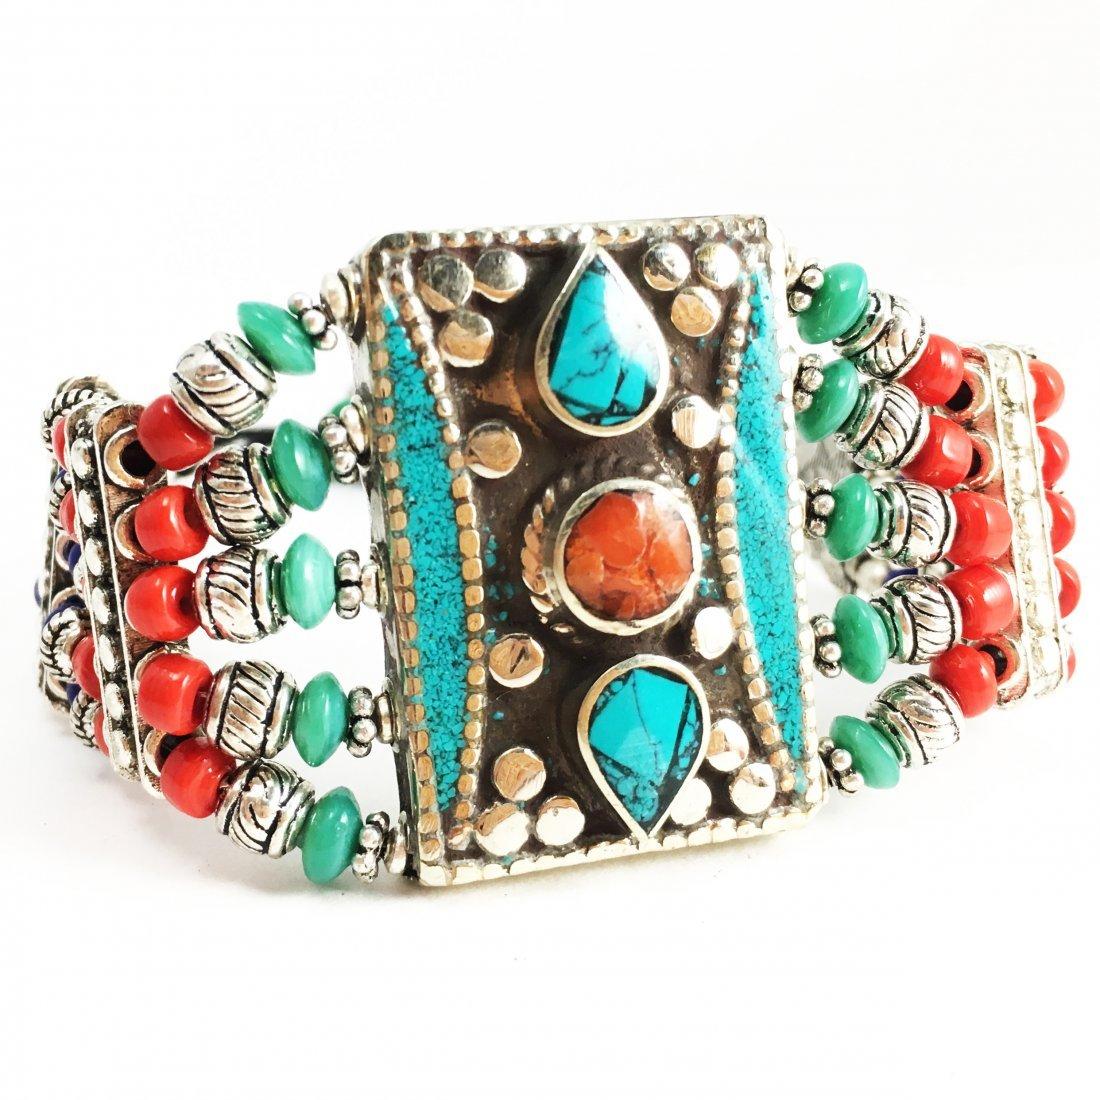 Tibetan Silver Women's & Man's Handmade Bracelet